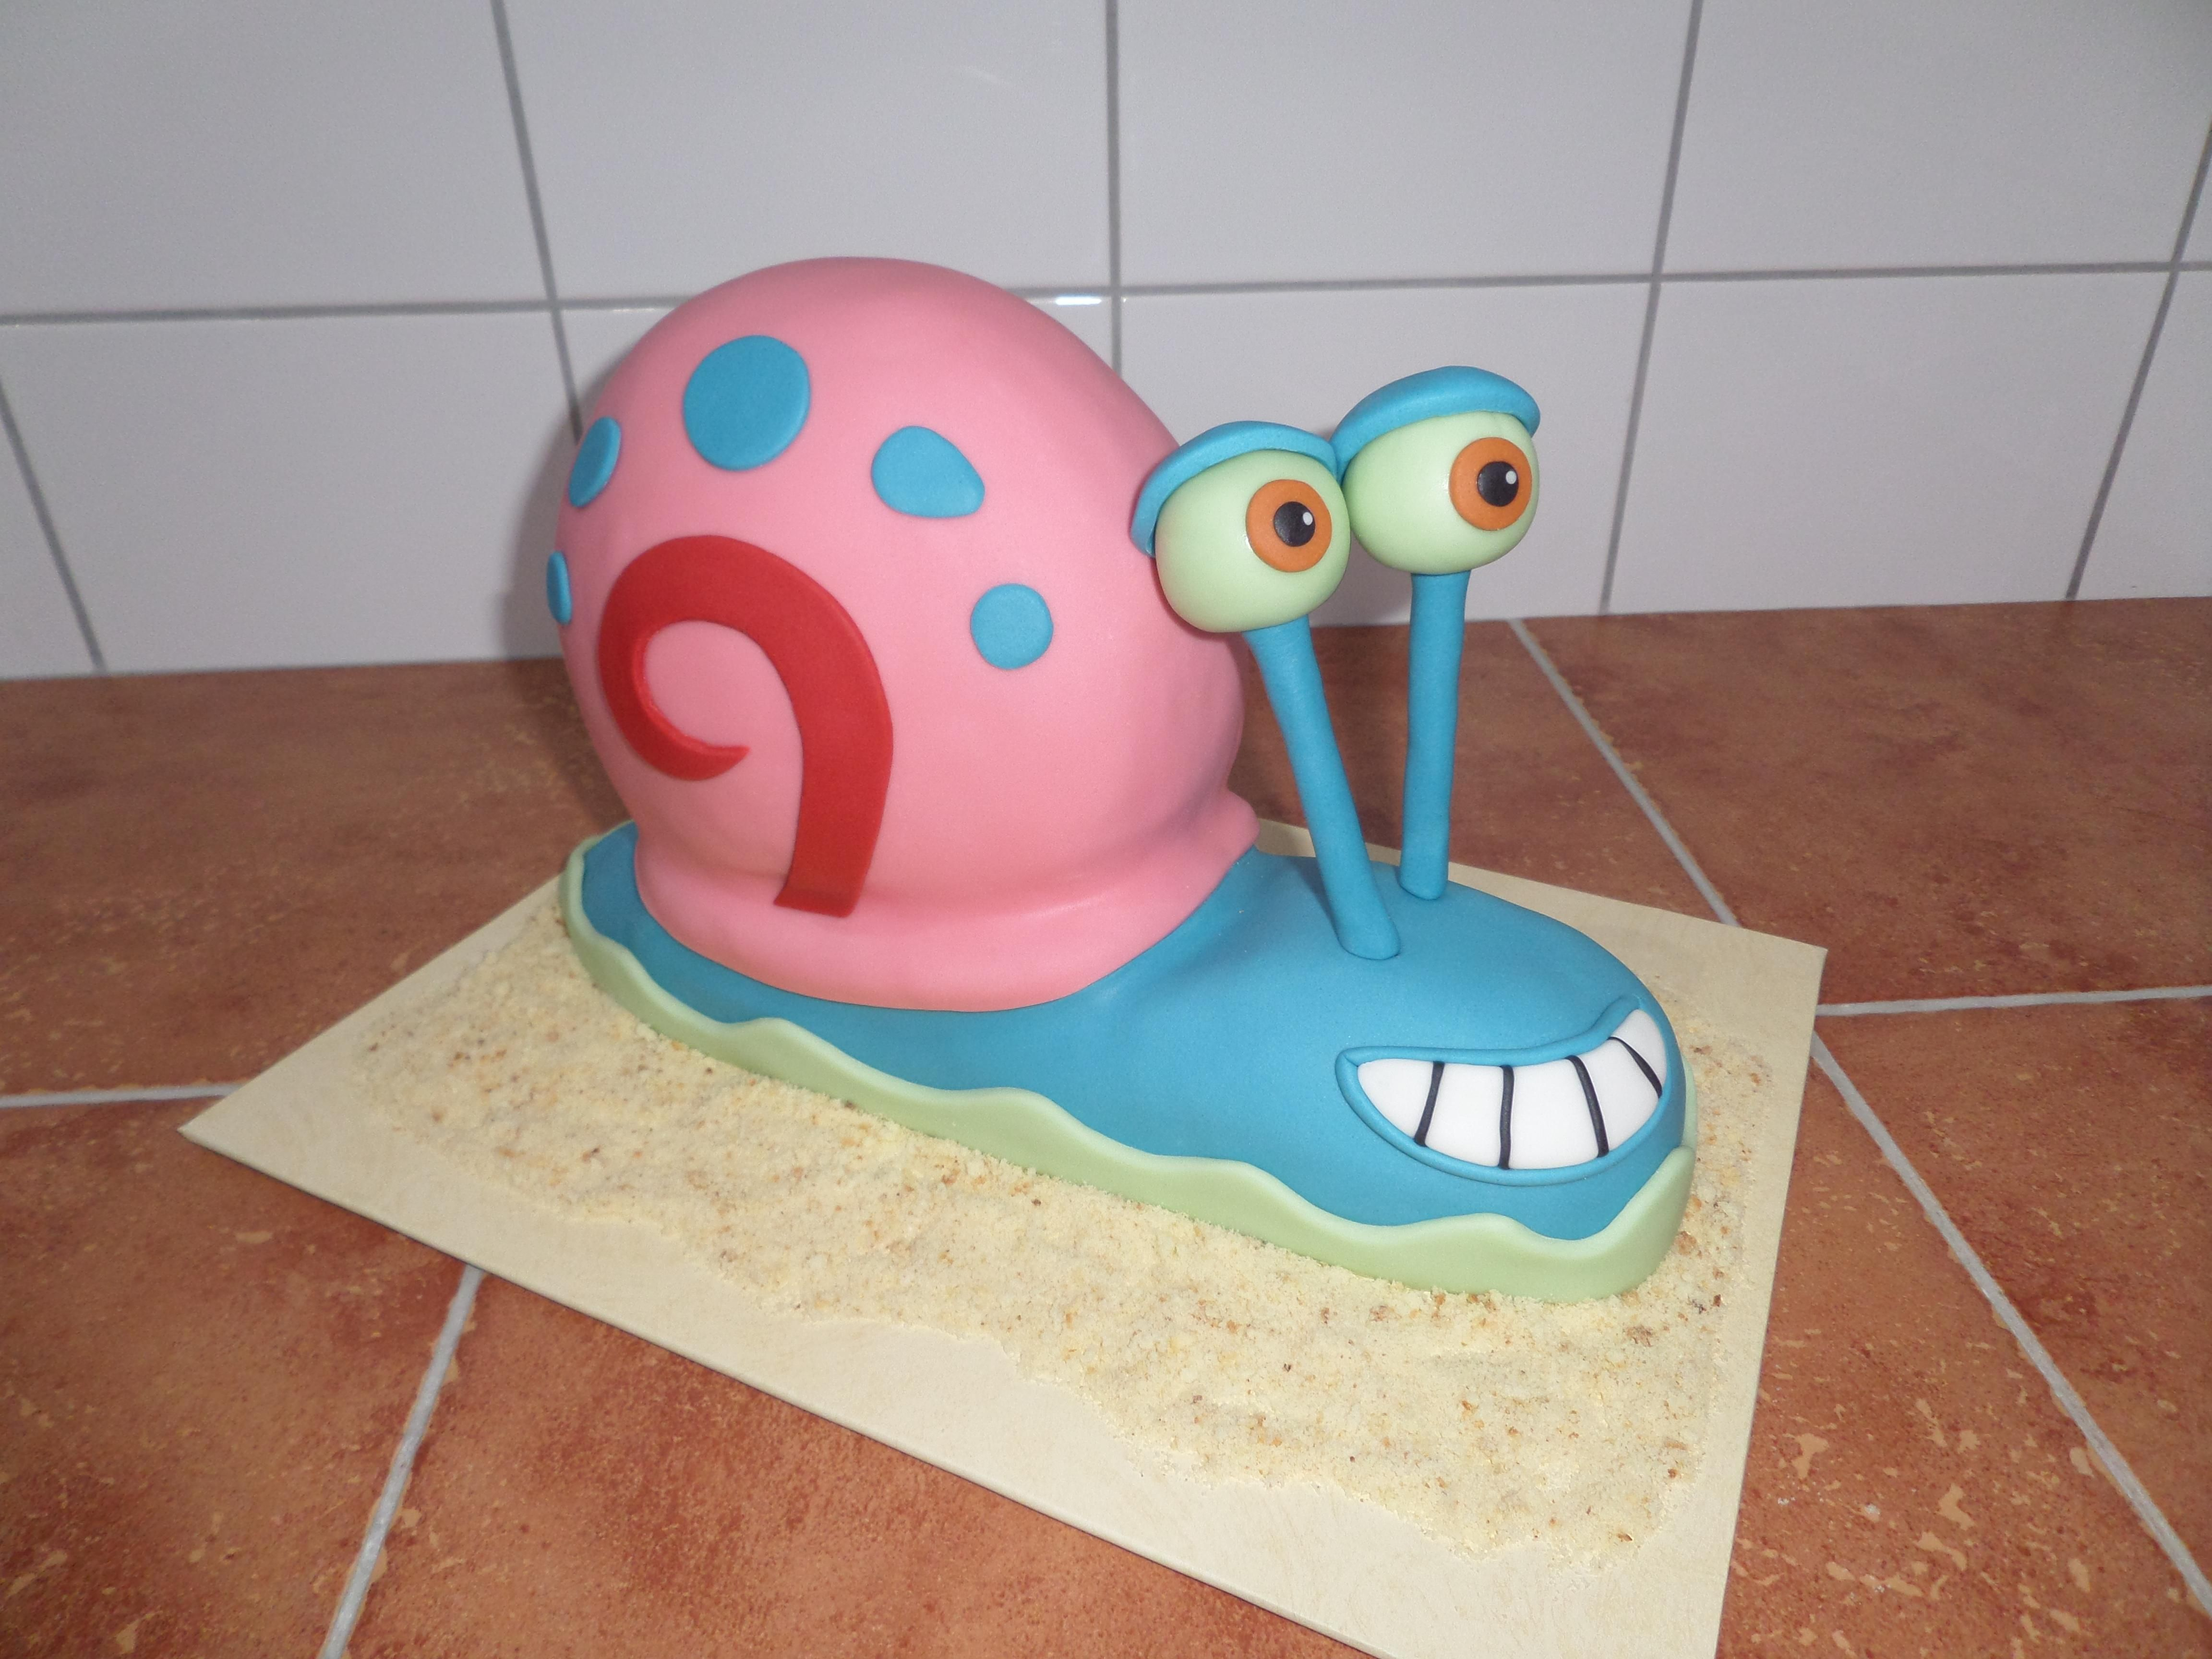 dort šnek gary z animovaného seriálu spongebob cake snail